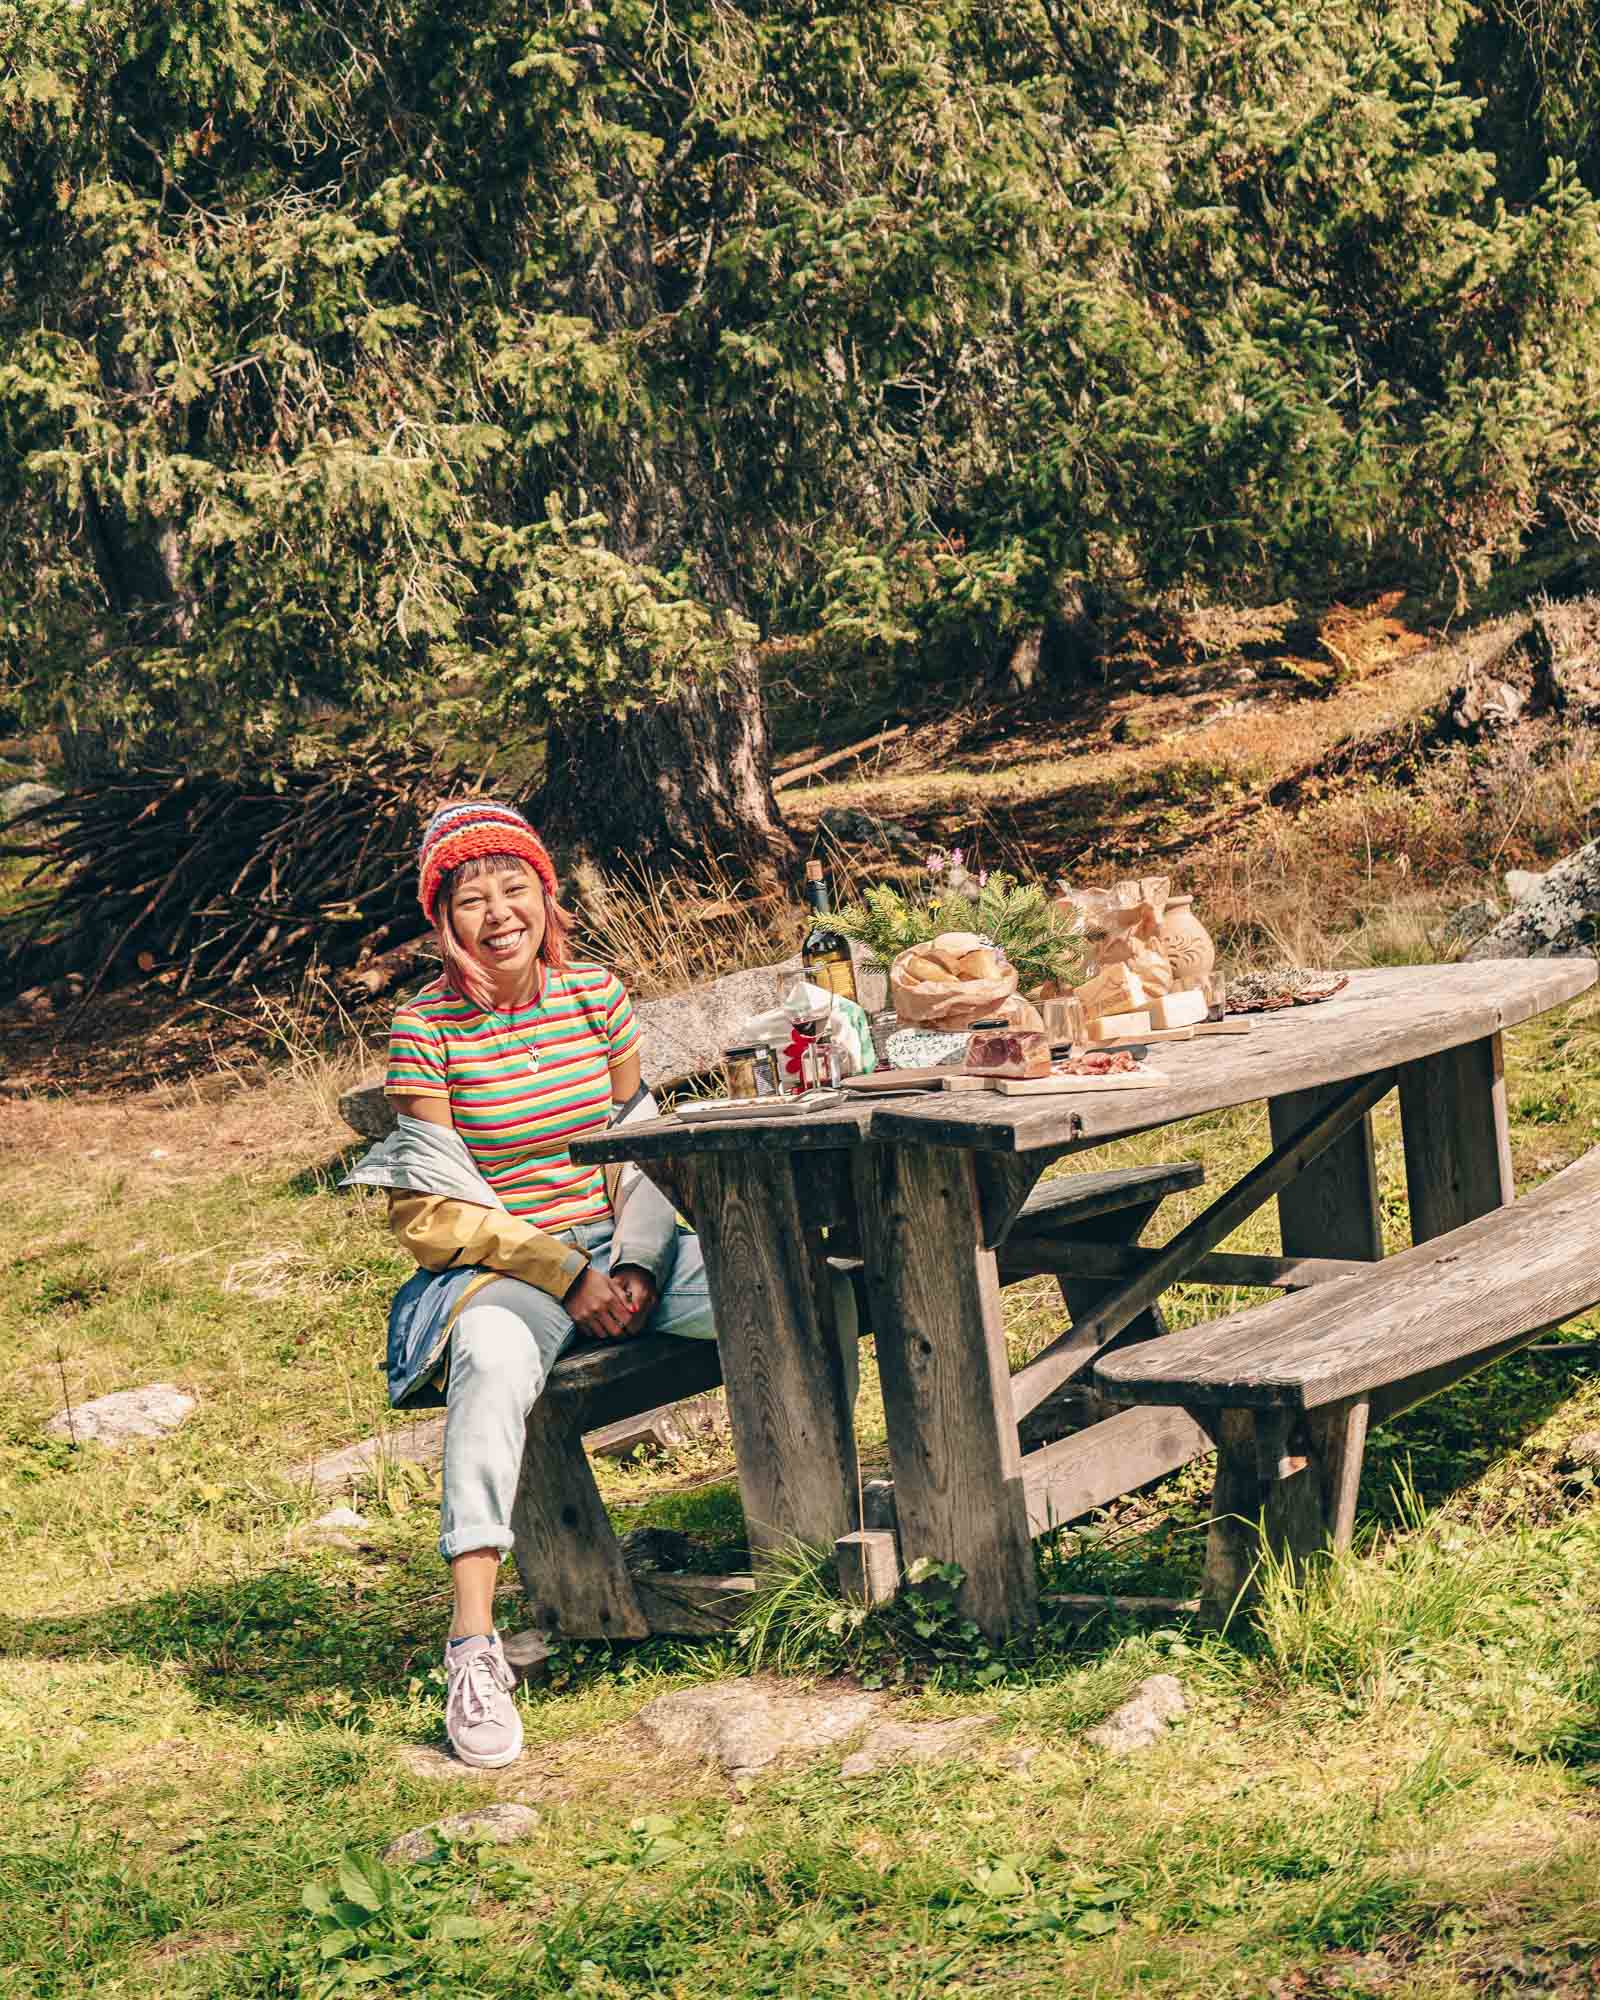 wild picnic